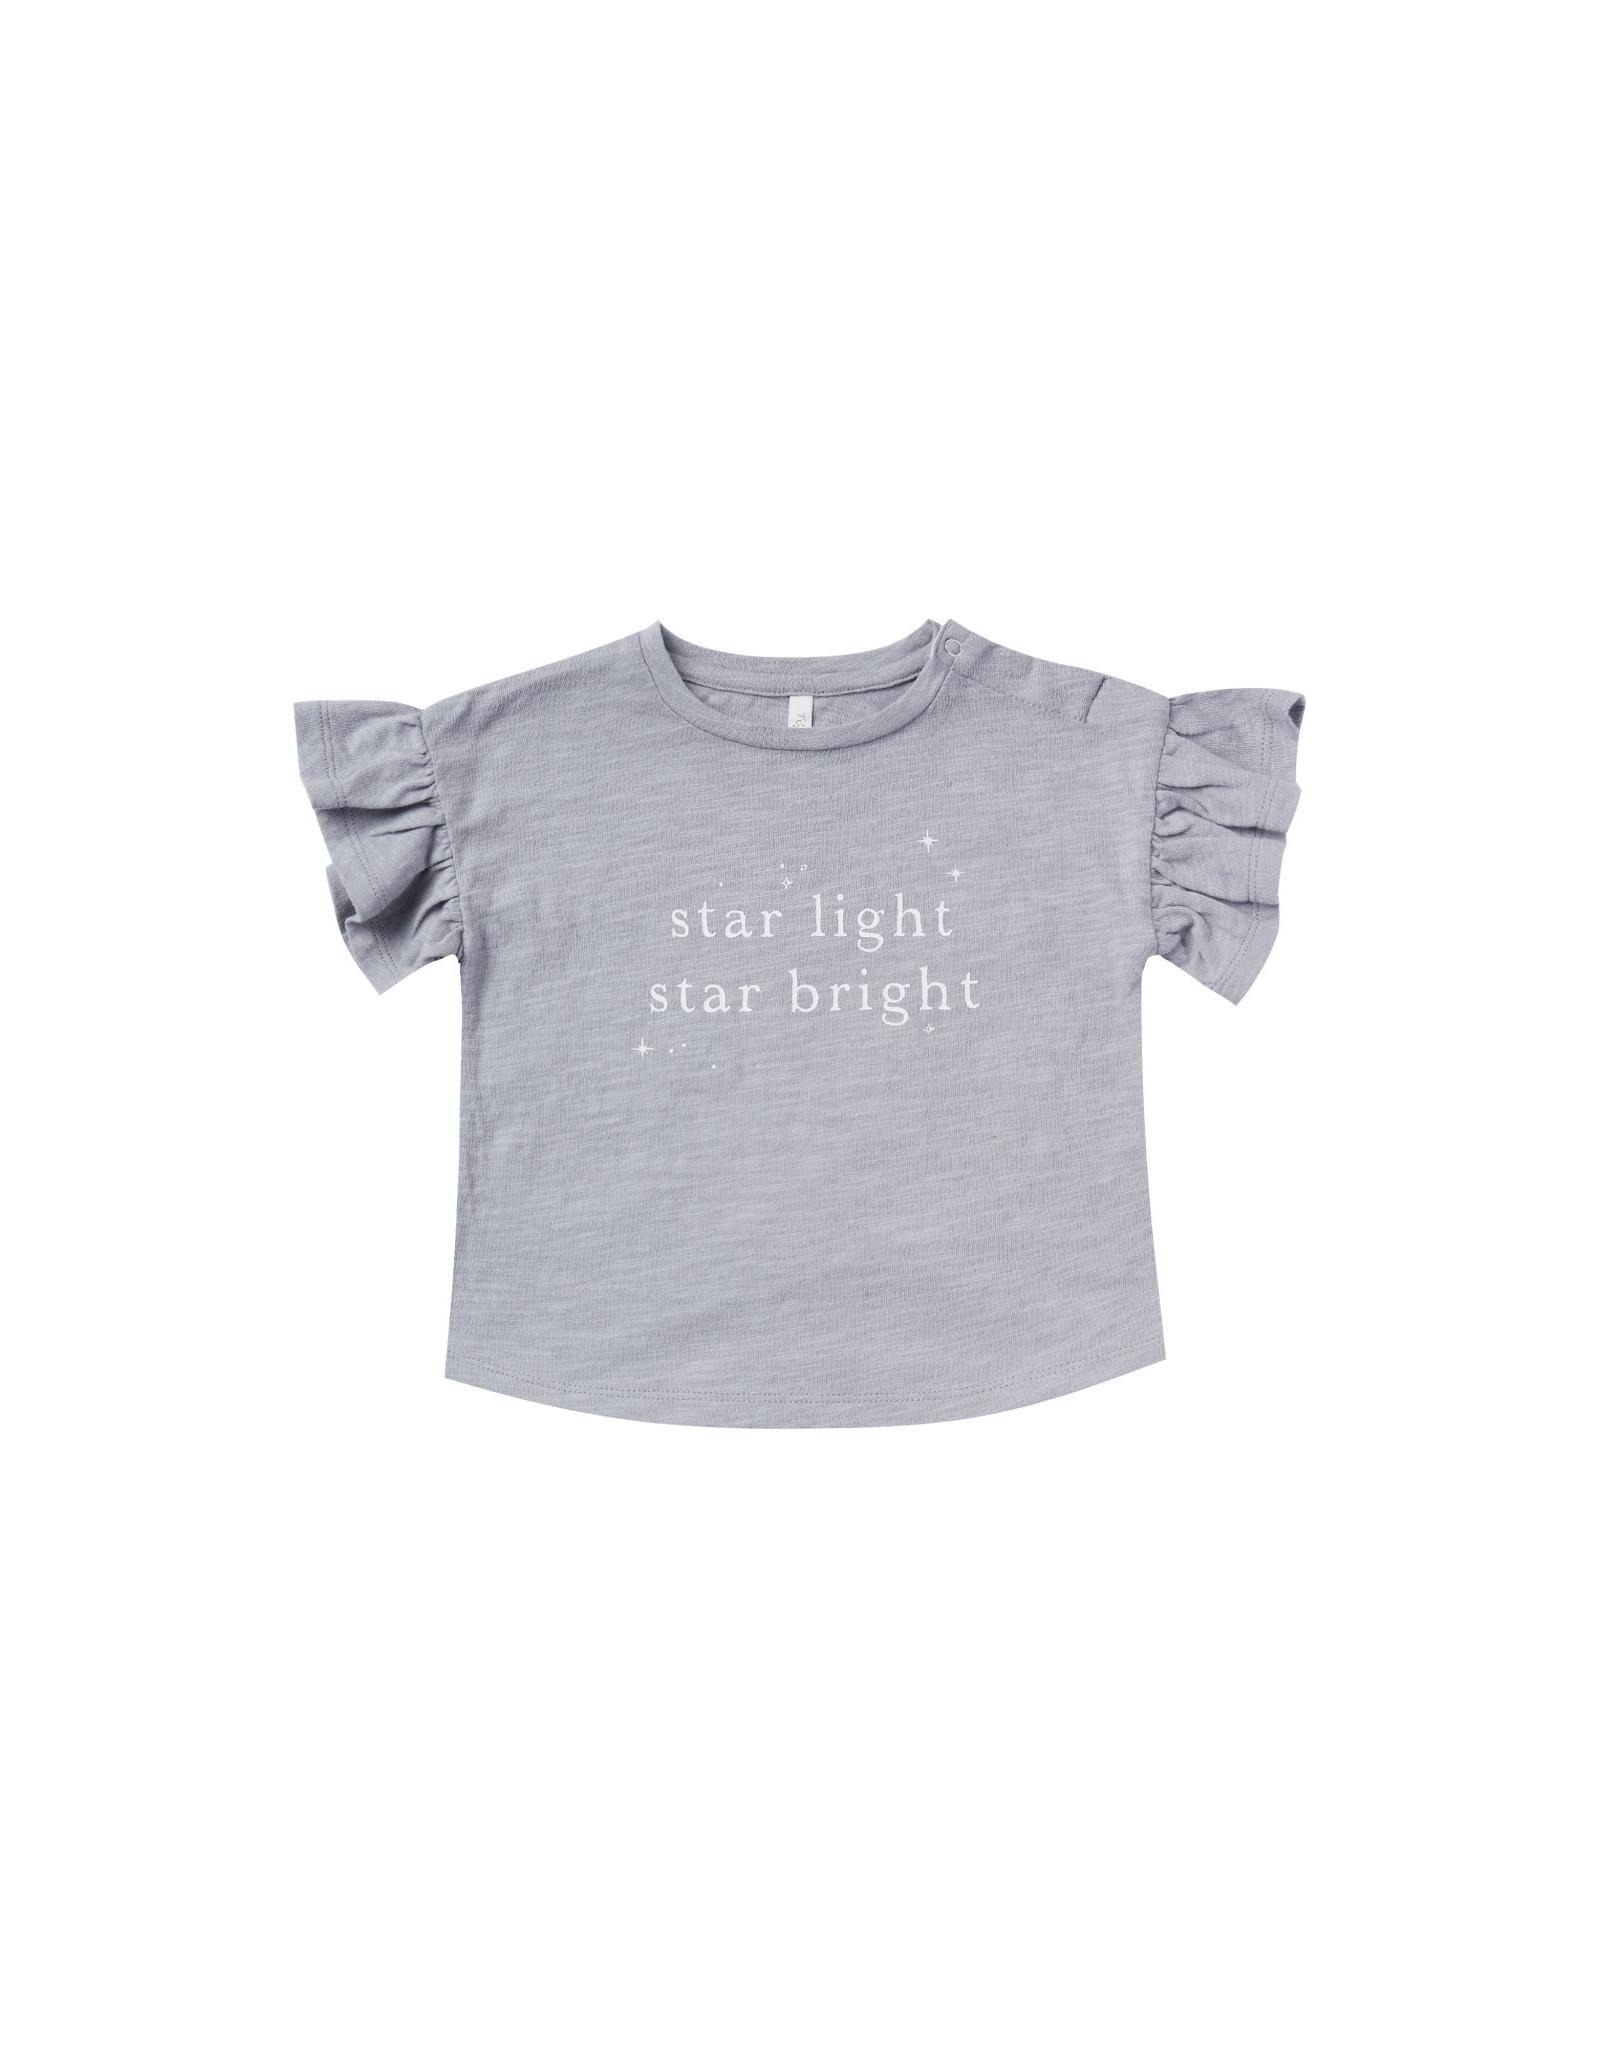 Rylee + Cru Rylee + Cru Star Light Flutter Tee